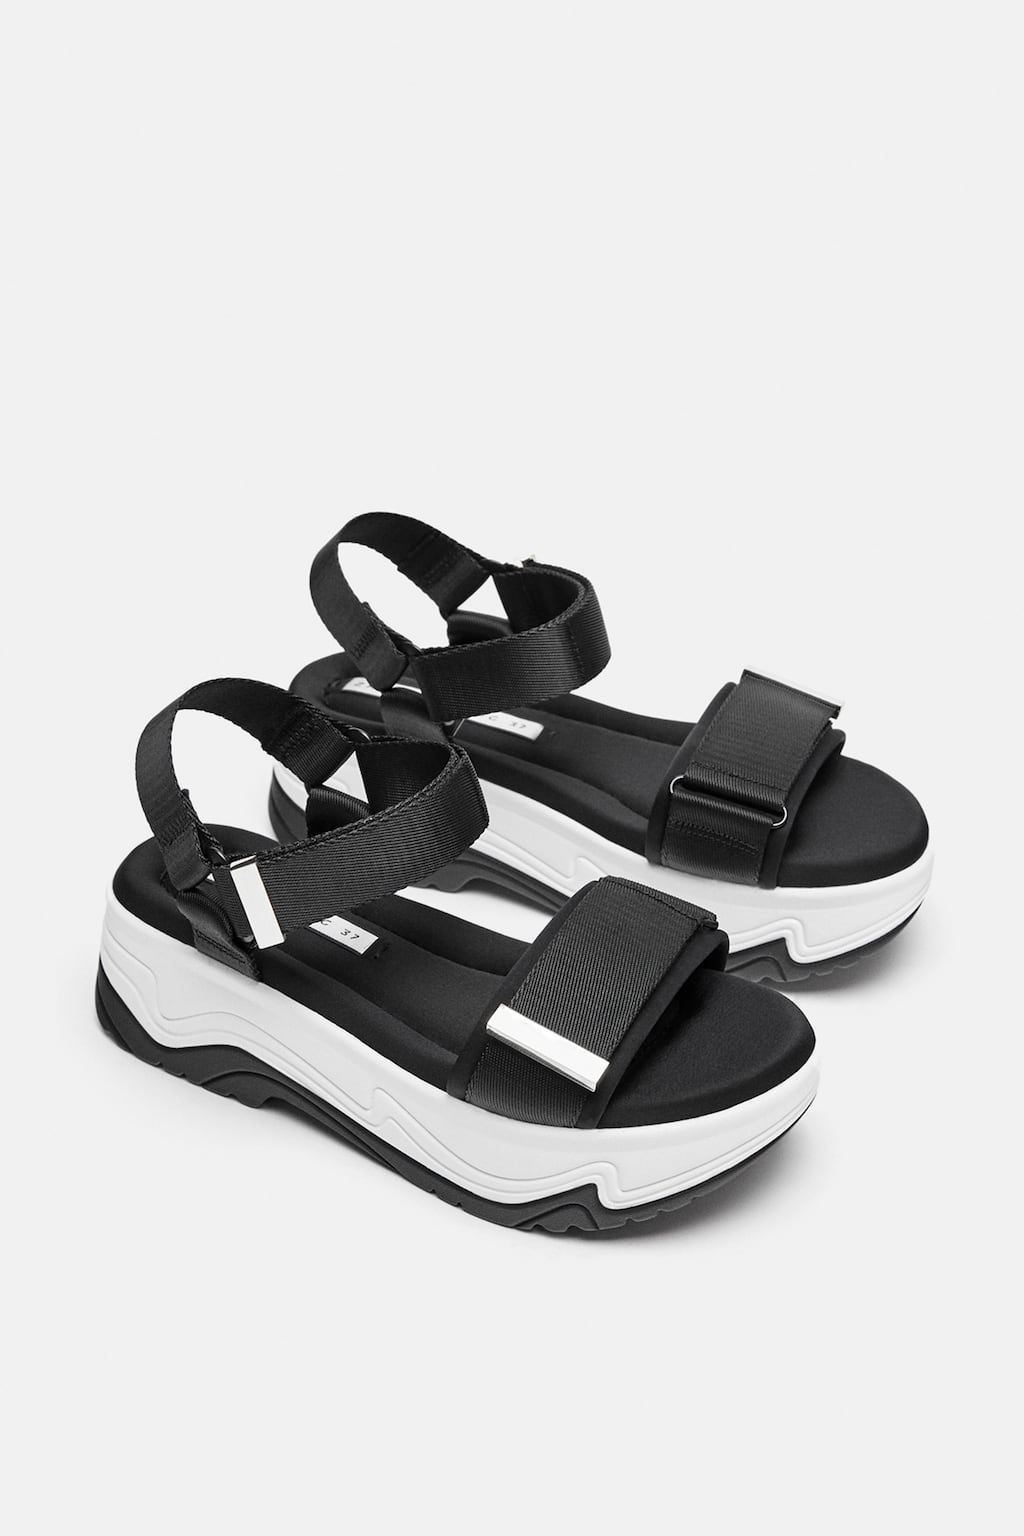 Image 4 Of Wedge Sneakers From Zara Sandalet Topuklular Dolgu Topuklu Sandalet